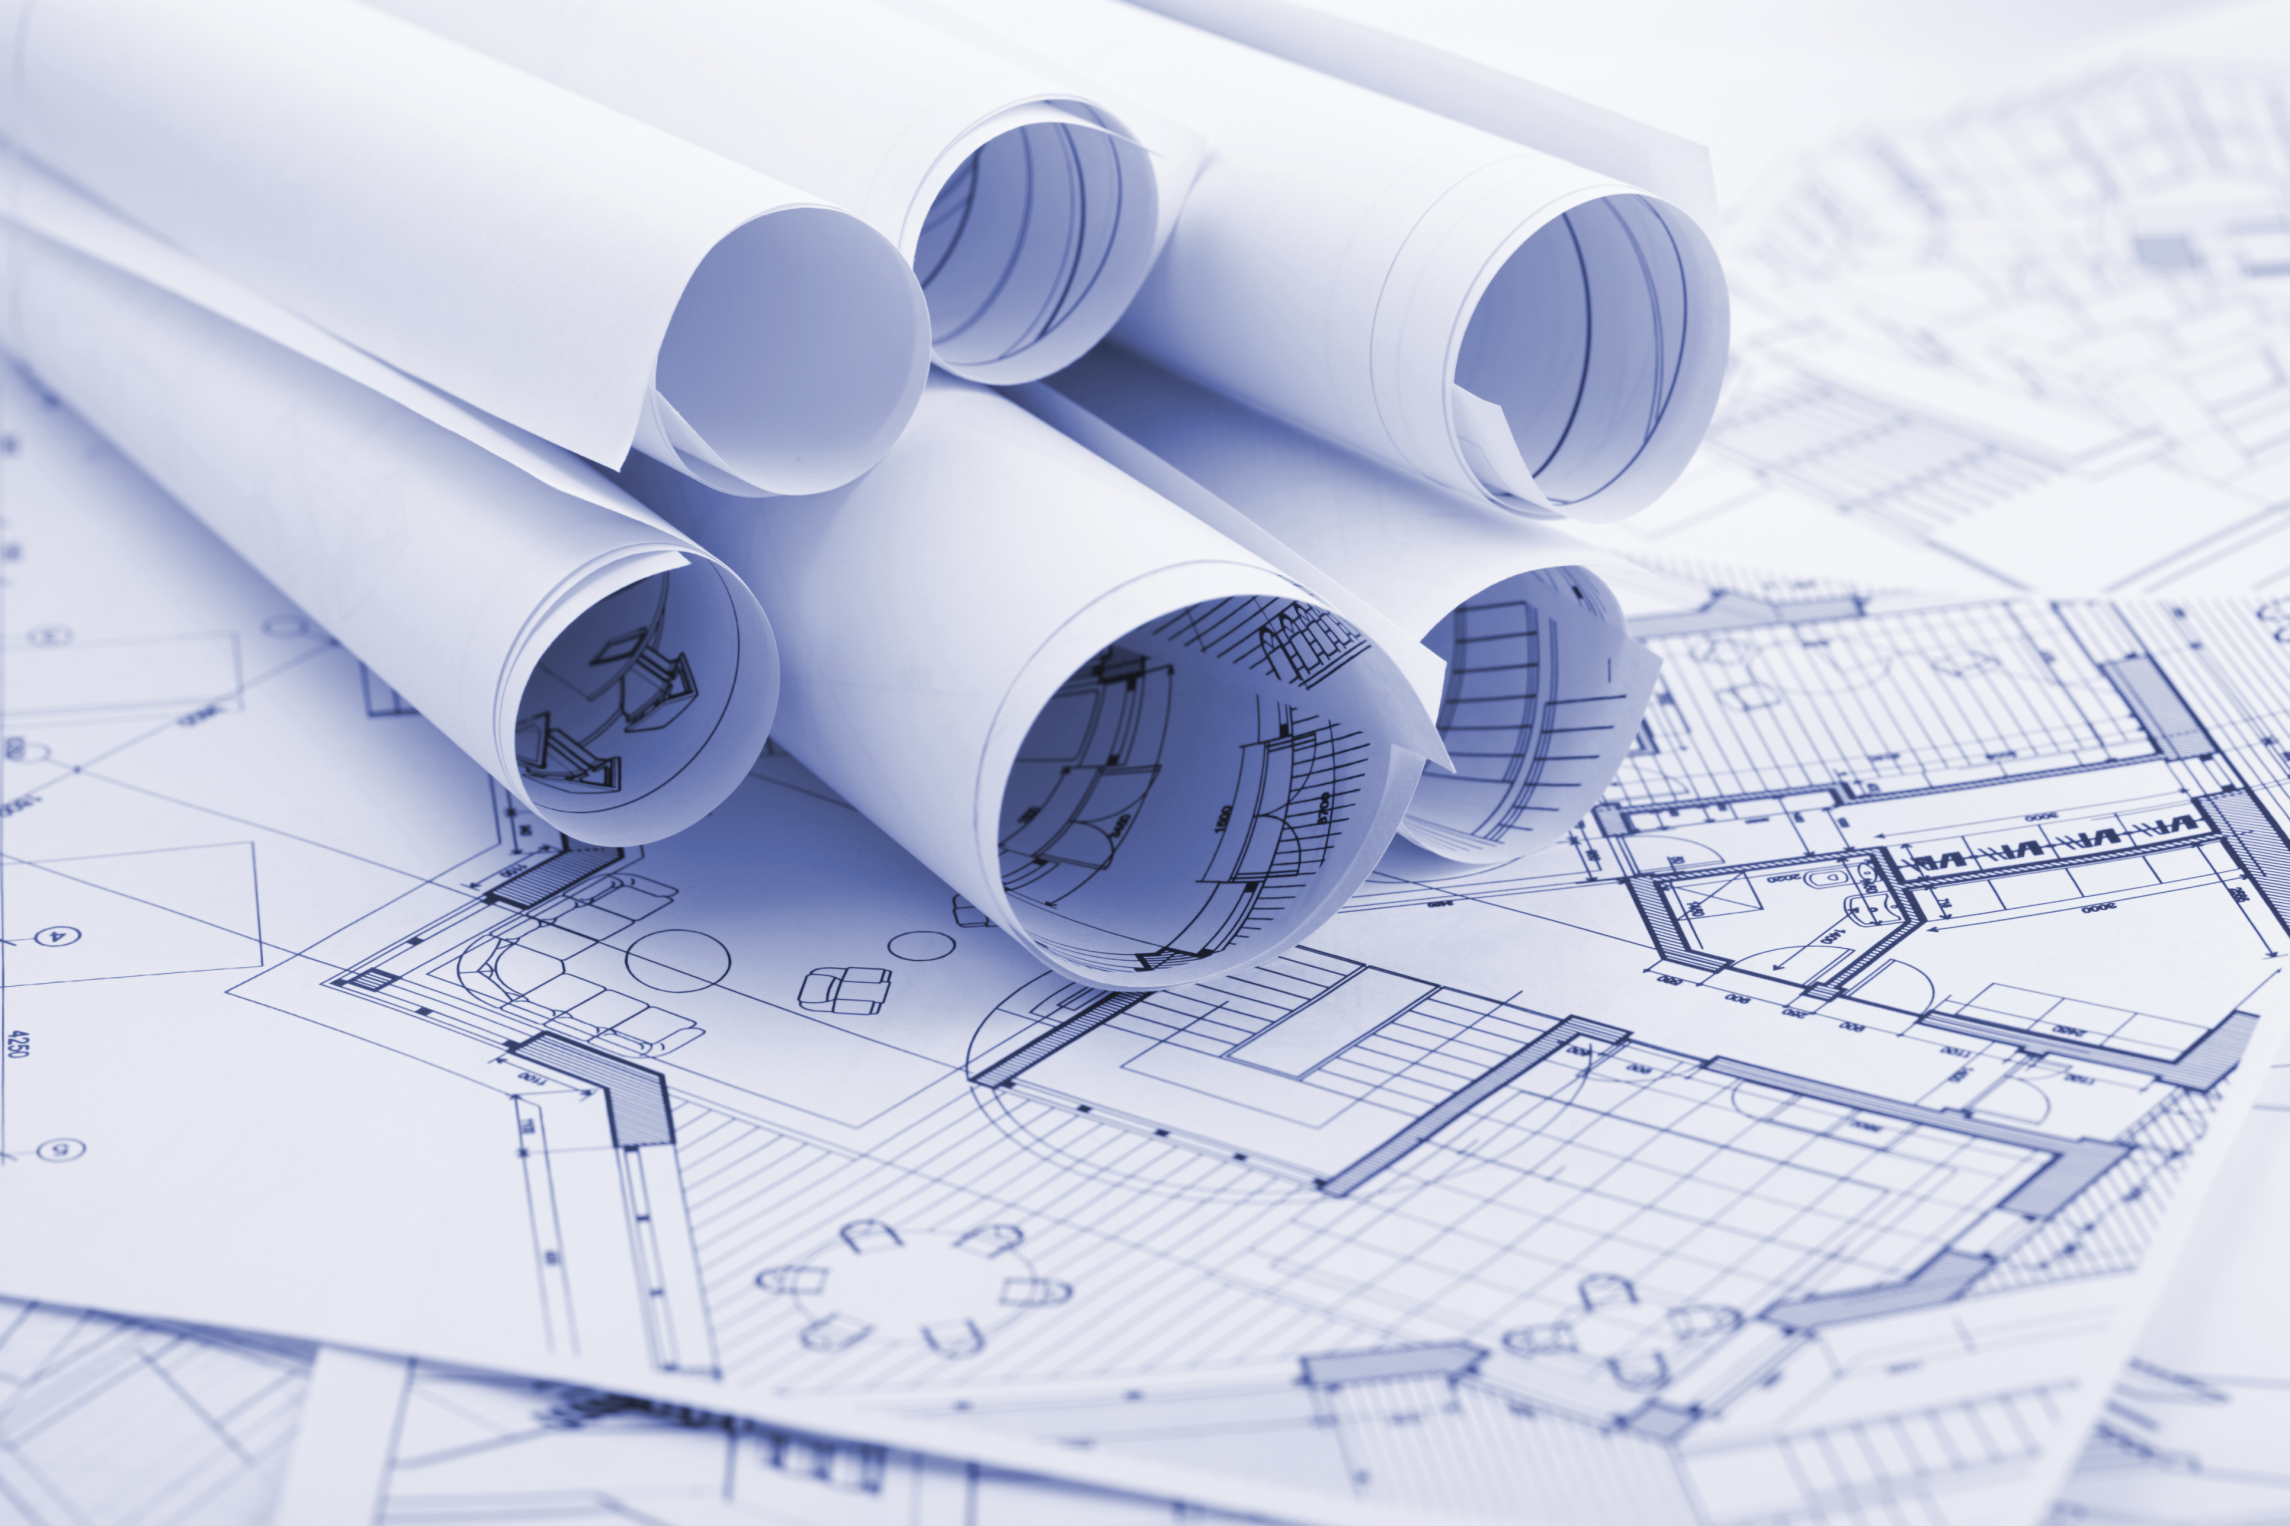 Av australia home theatre design services design services malvernweather Gallery